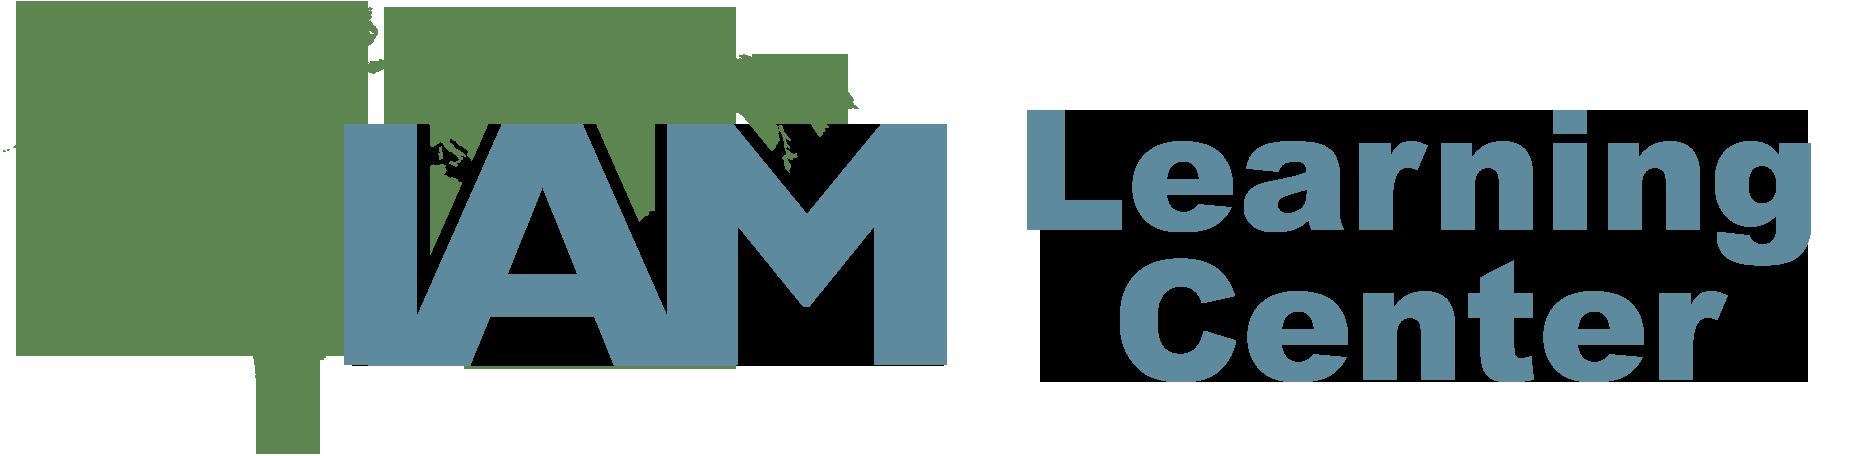 IAM Learning Center